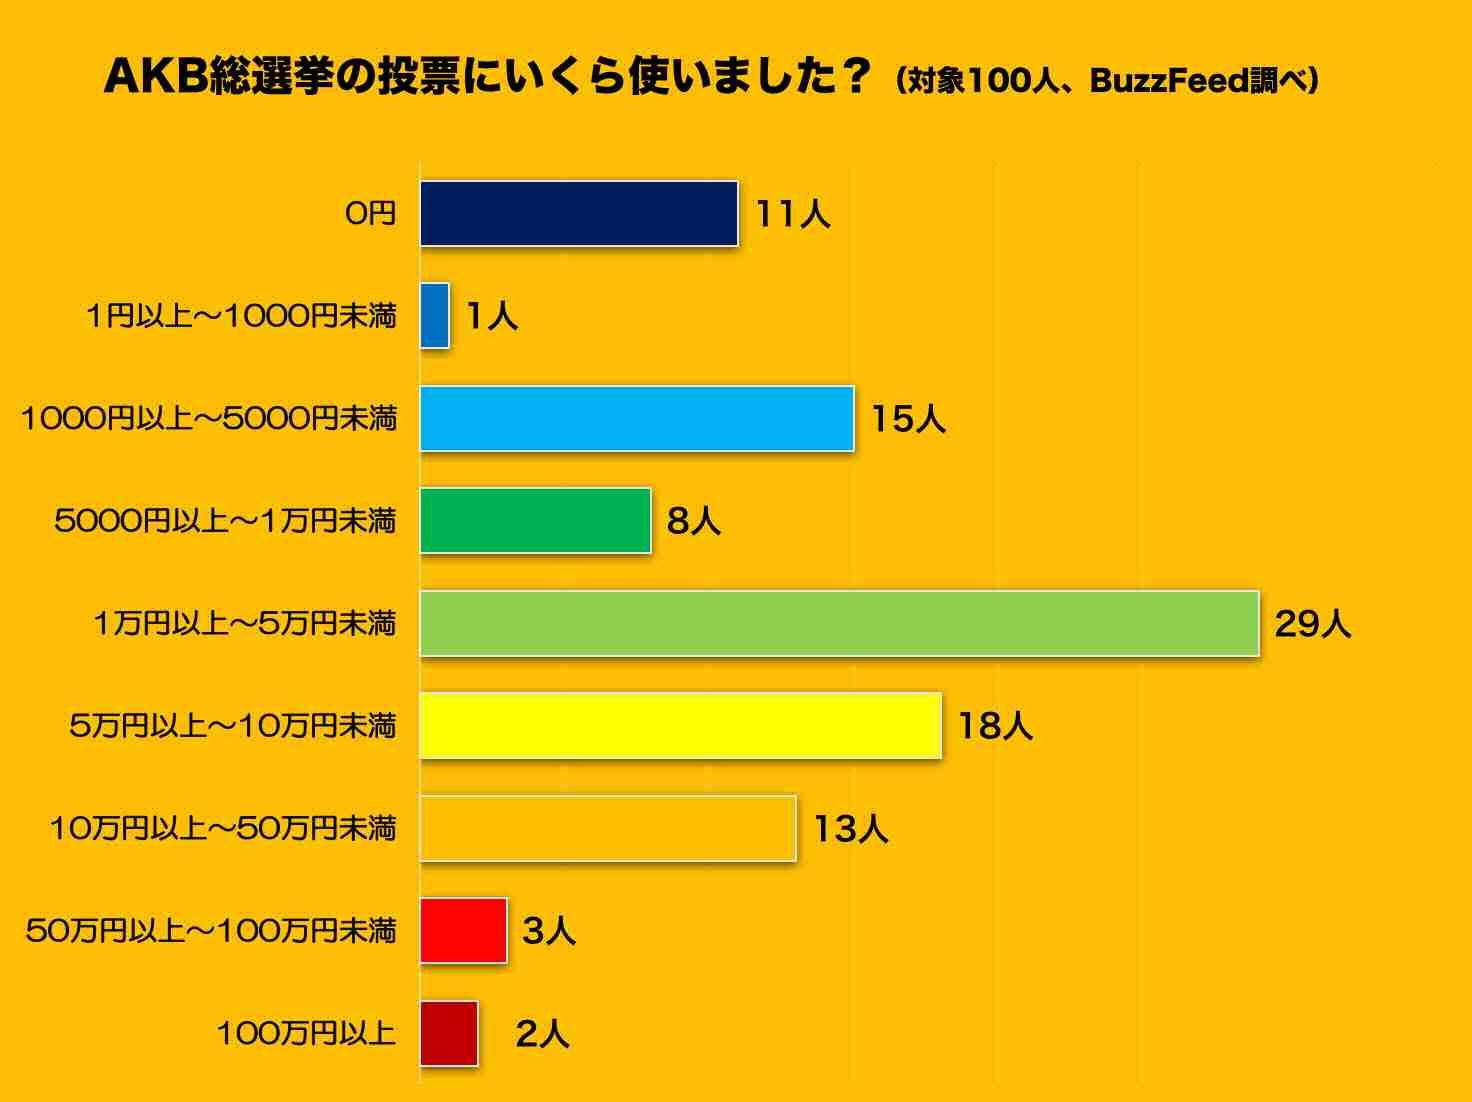 AKB総選挙 の投票にいくら使った? ファン100人の平均投資額は「9万7548円」 (BuzzFeed Japan) - Yahoo!ニュース